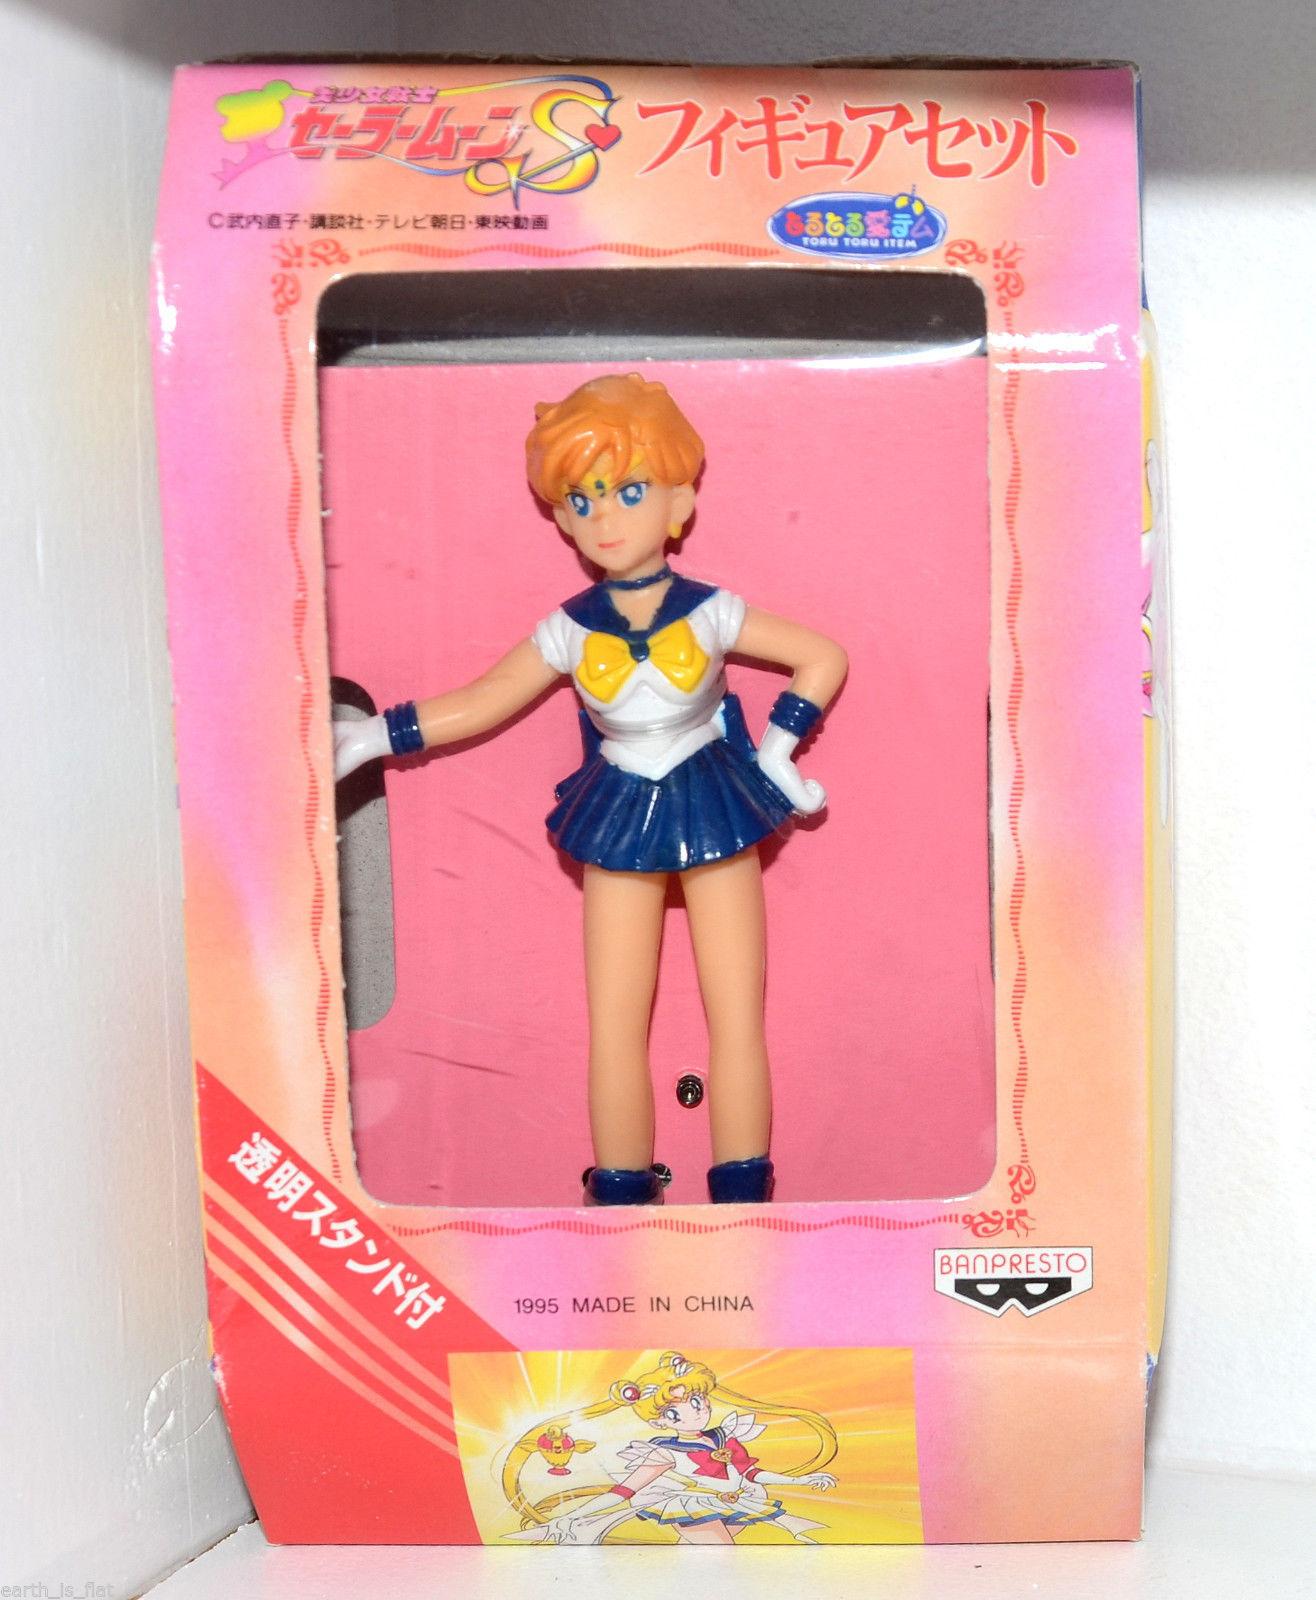 New Sailor Moon S 1995 Figure Set Banpresto Toru Toru Item Sailor Uranus Action